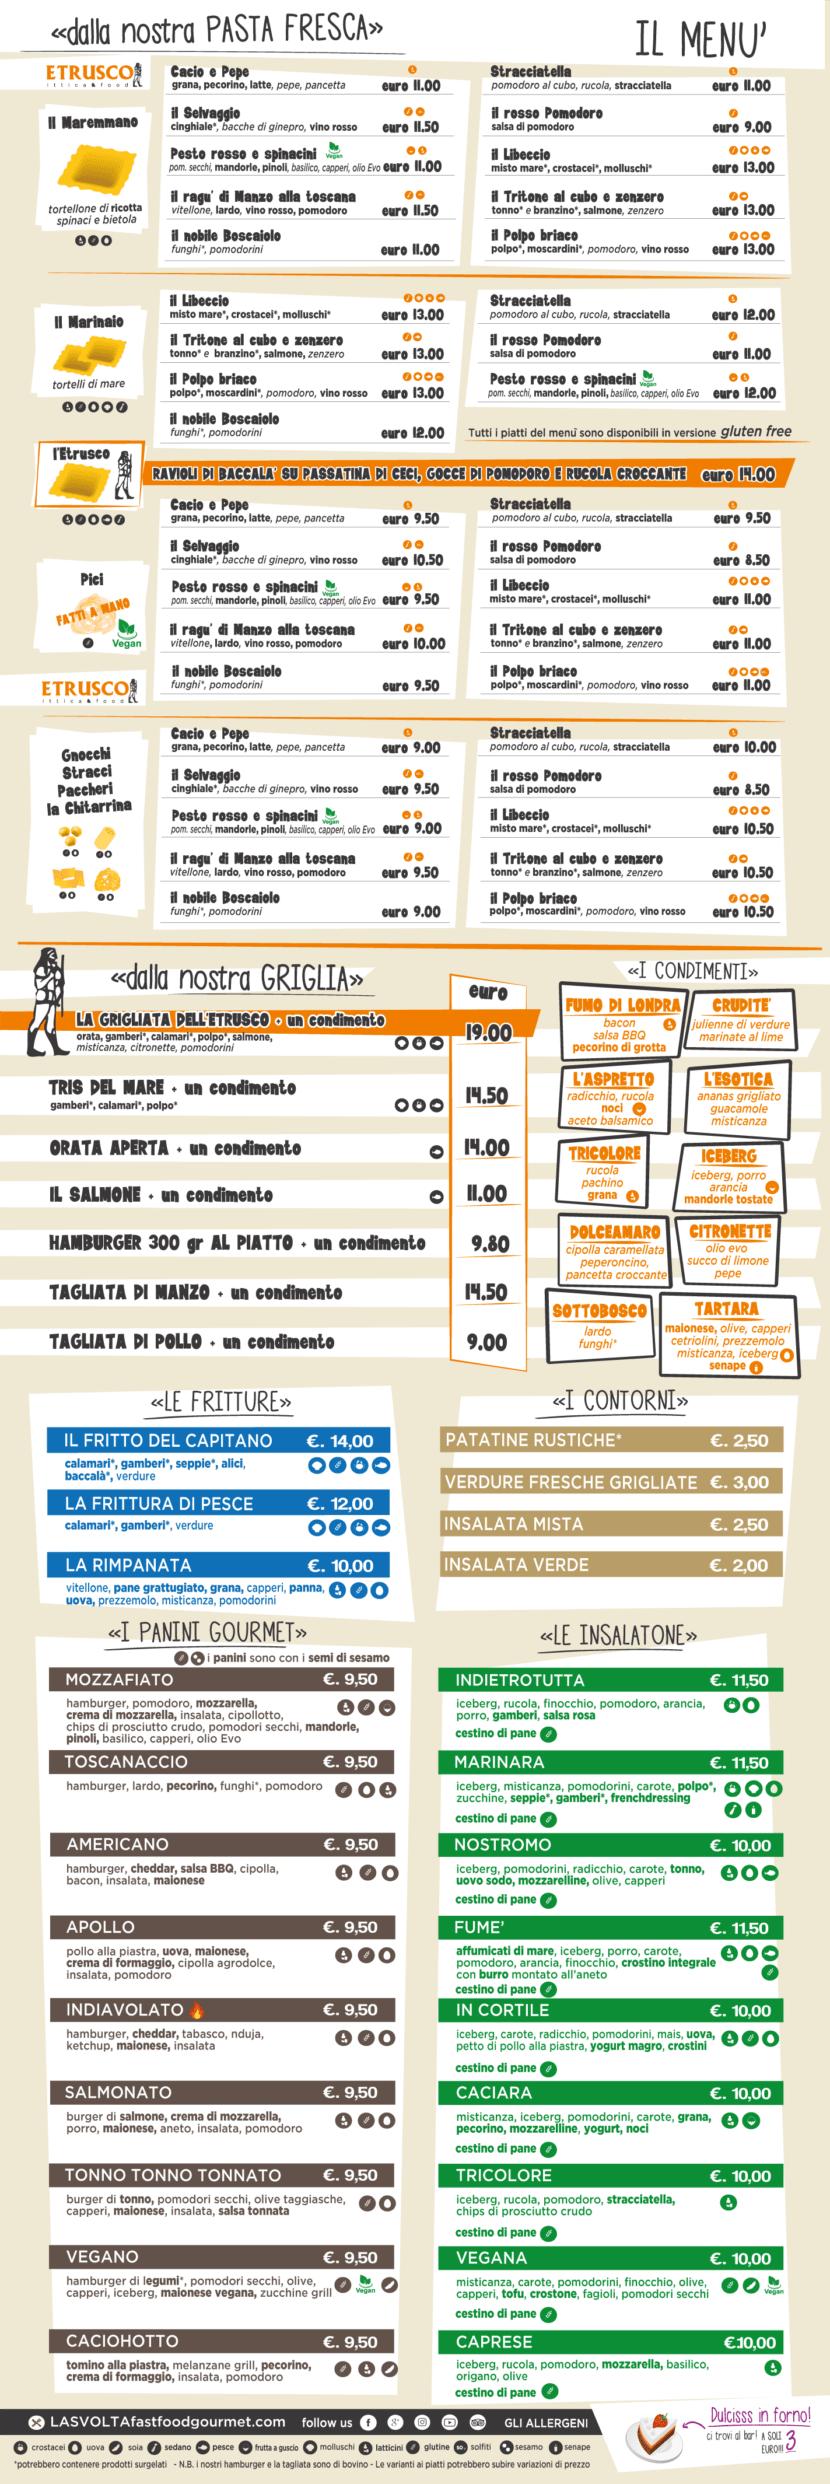 la svolta fast food menu